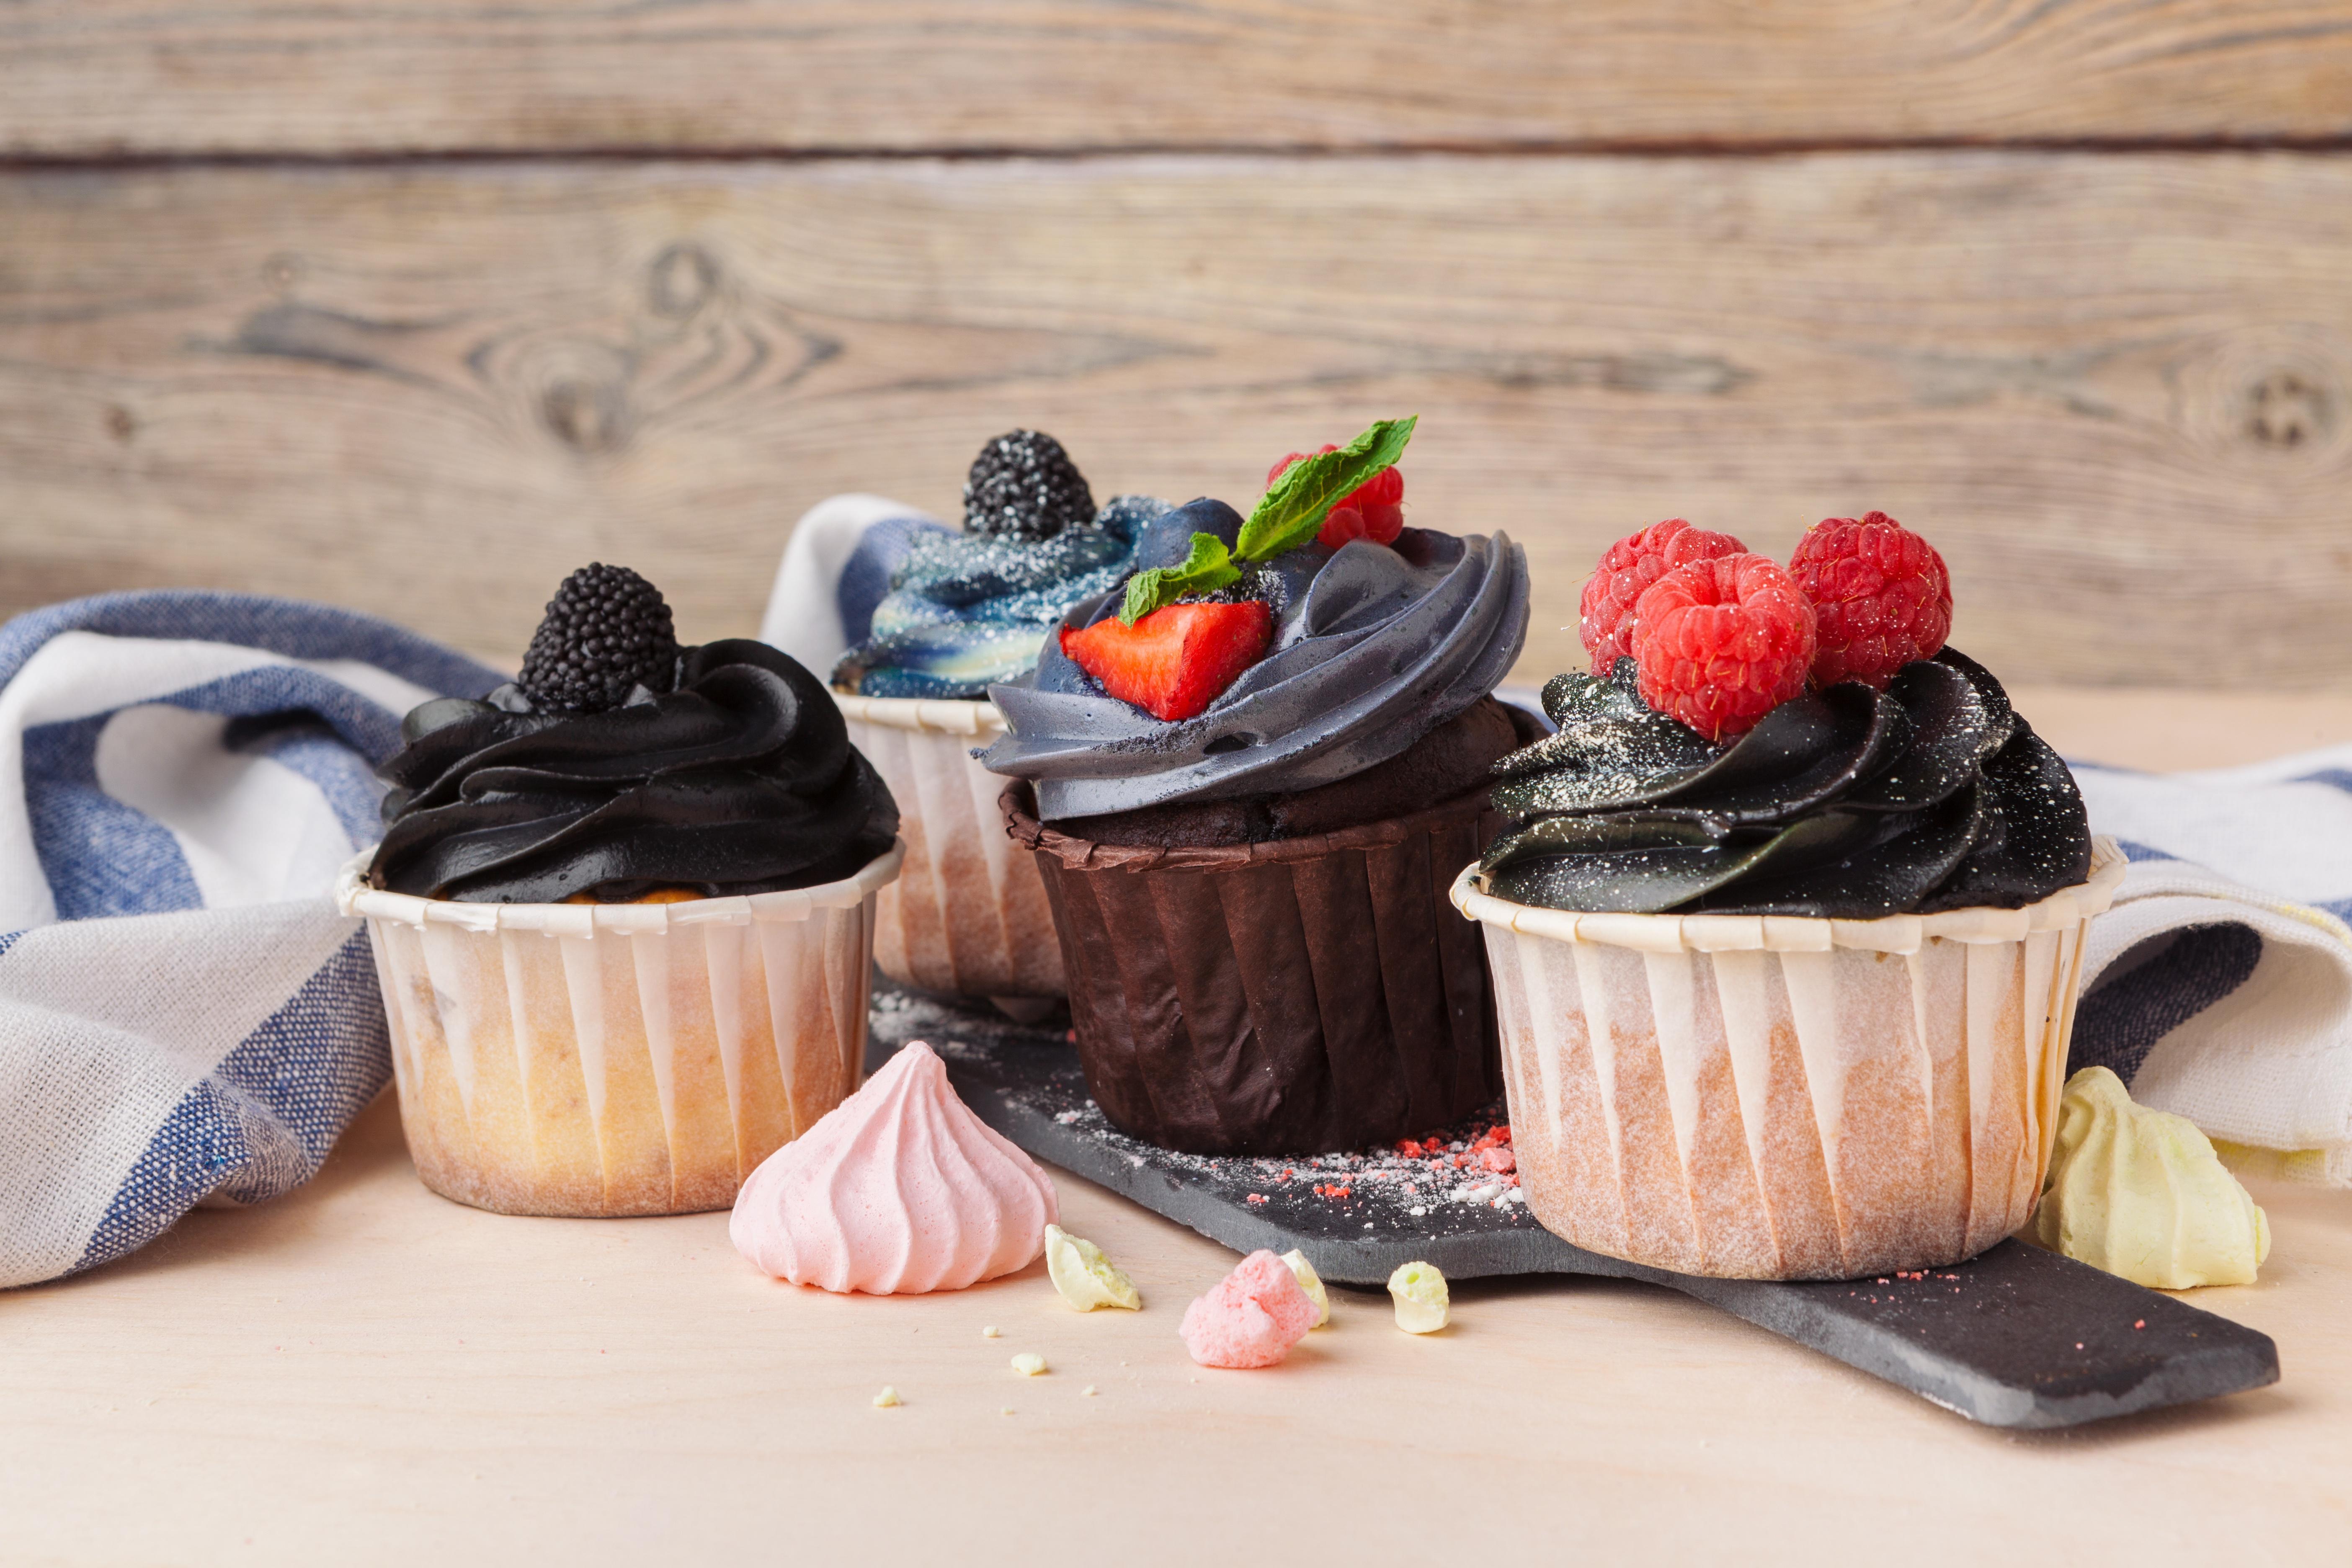 Berry Cupcake Dessert 5616x3744